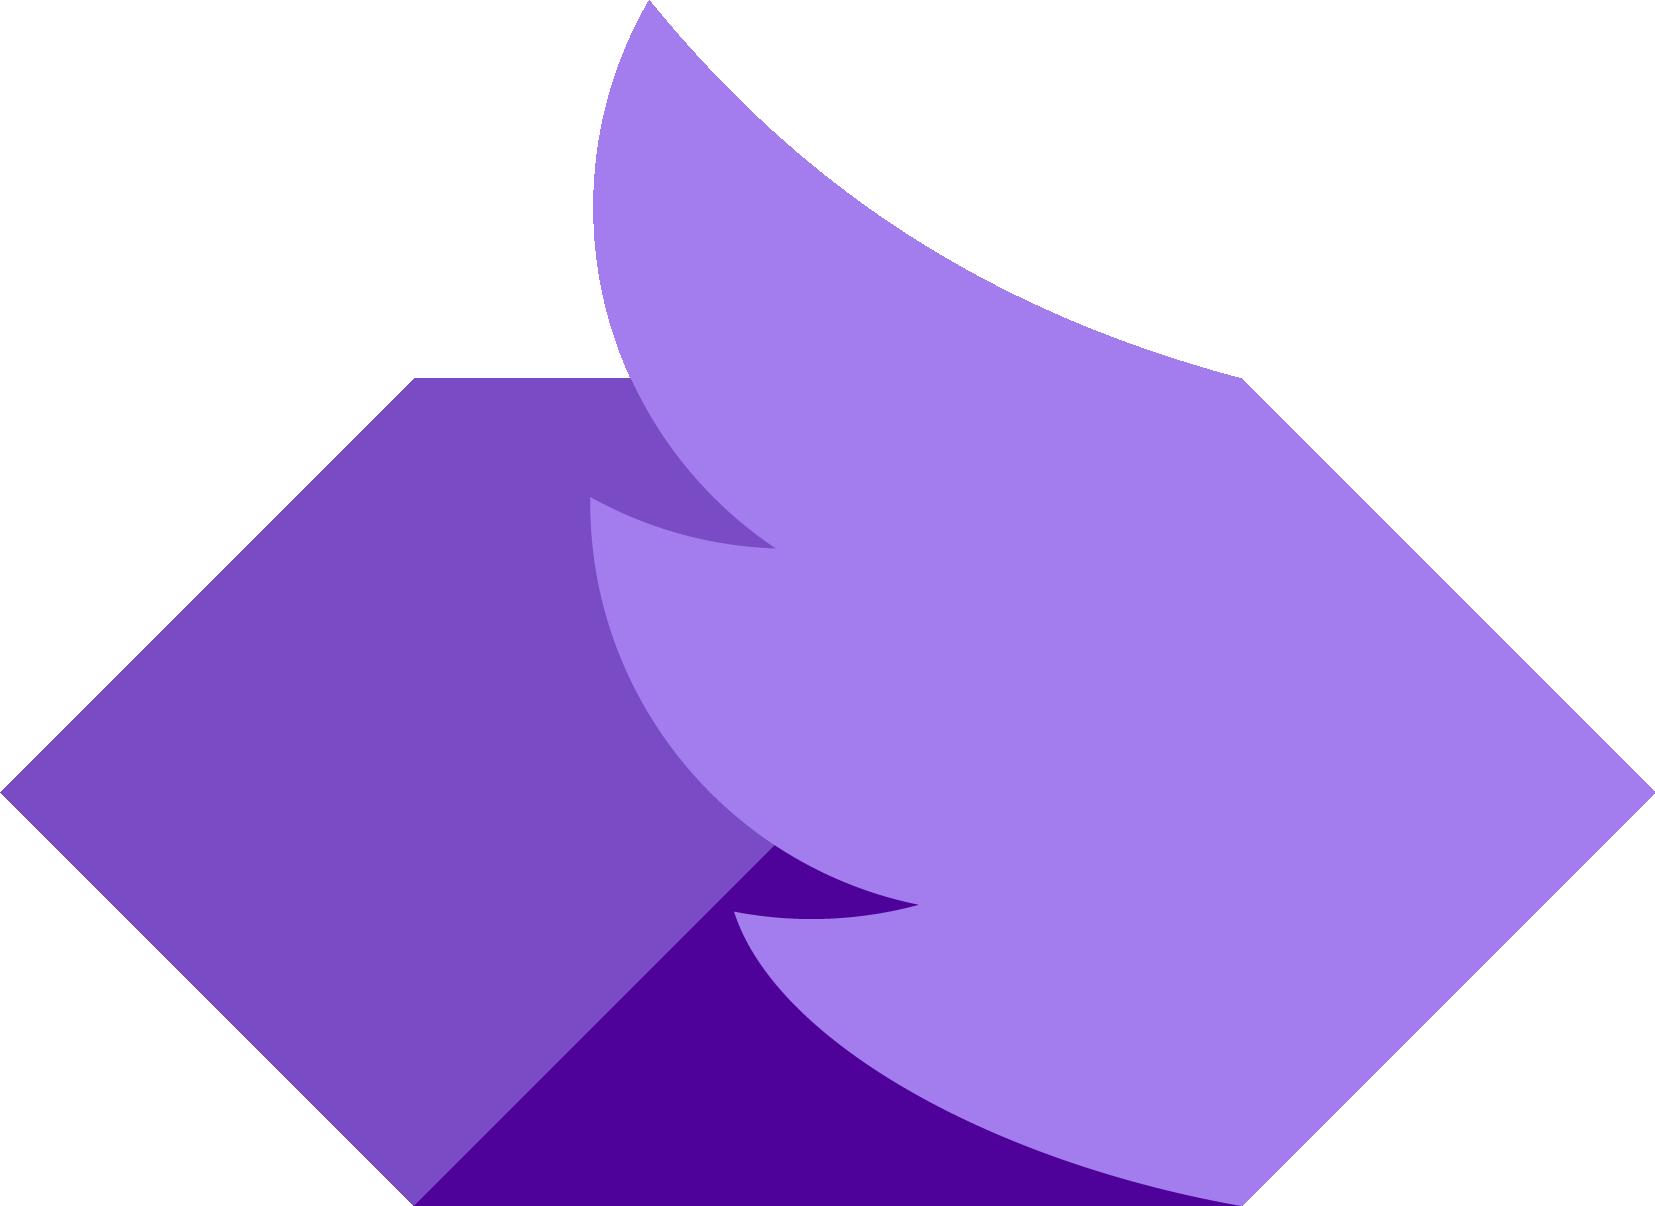 Twitter transparent png. Premium apis developers were